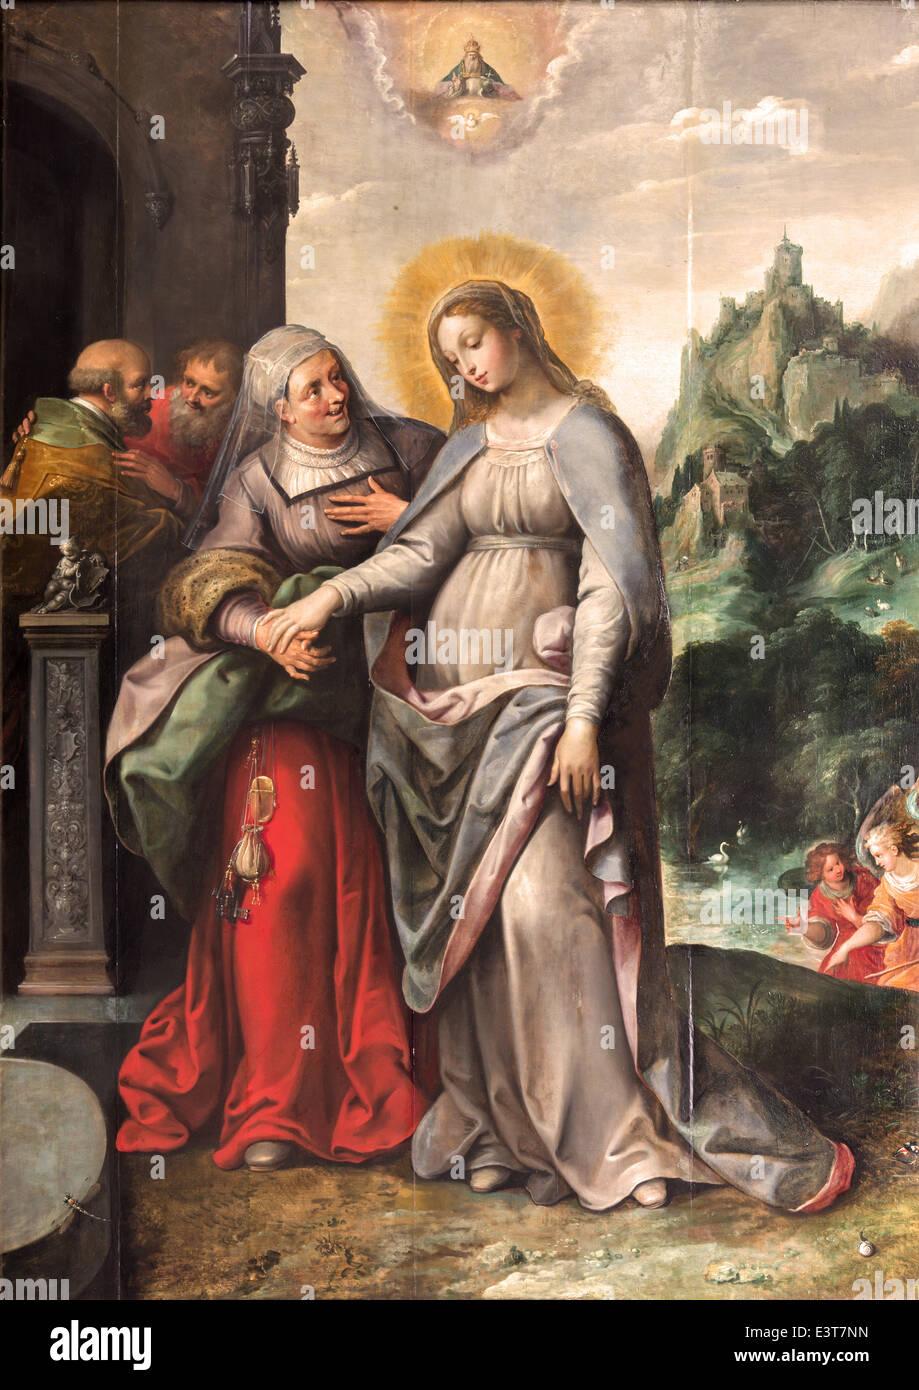 Antwerp - The Visitation of Virgin Mary to Elizabeth by Frans Francken (1581 - 1642) in Saint Pauls church (Paulskerk) Stock Photo